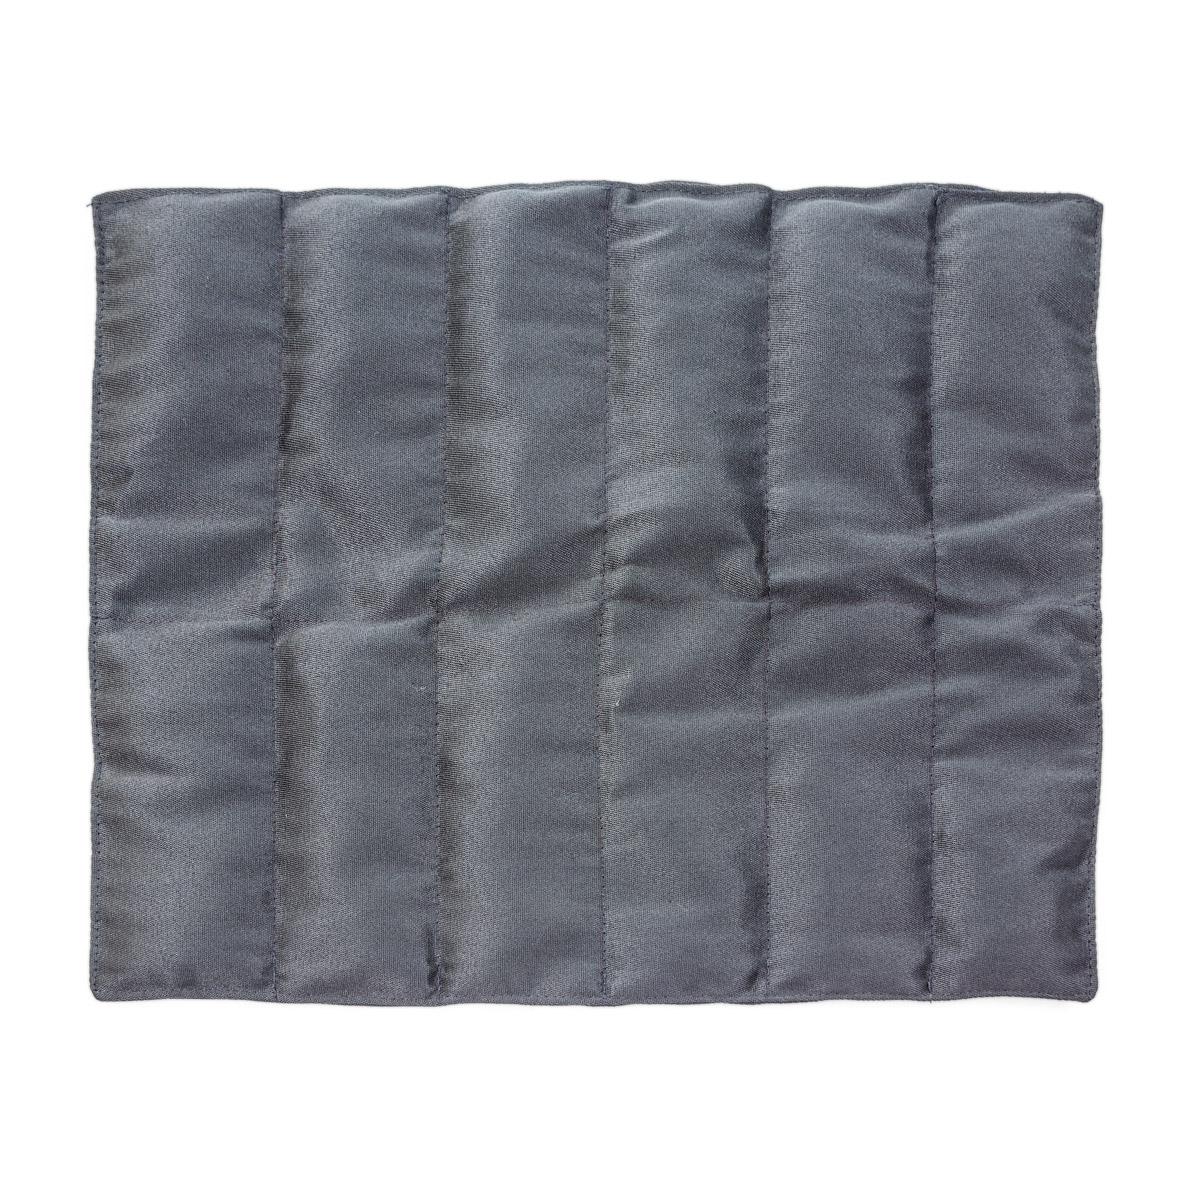 Коврик с шунгитом  р. 35х28 - Текстиль для здоровья артикул: 21143